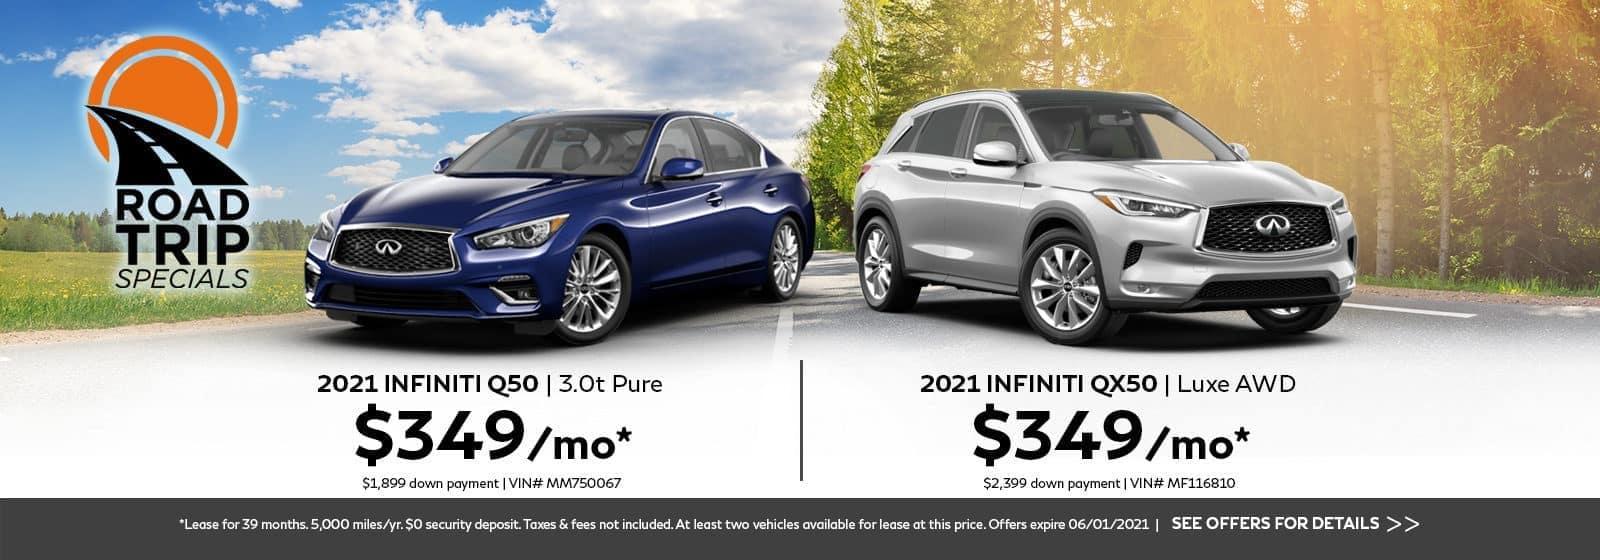 2021 INFINITI Q50 and 2021 INFINITI QX50